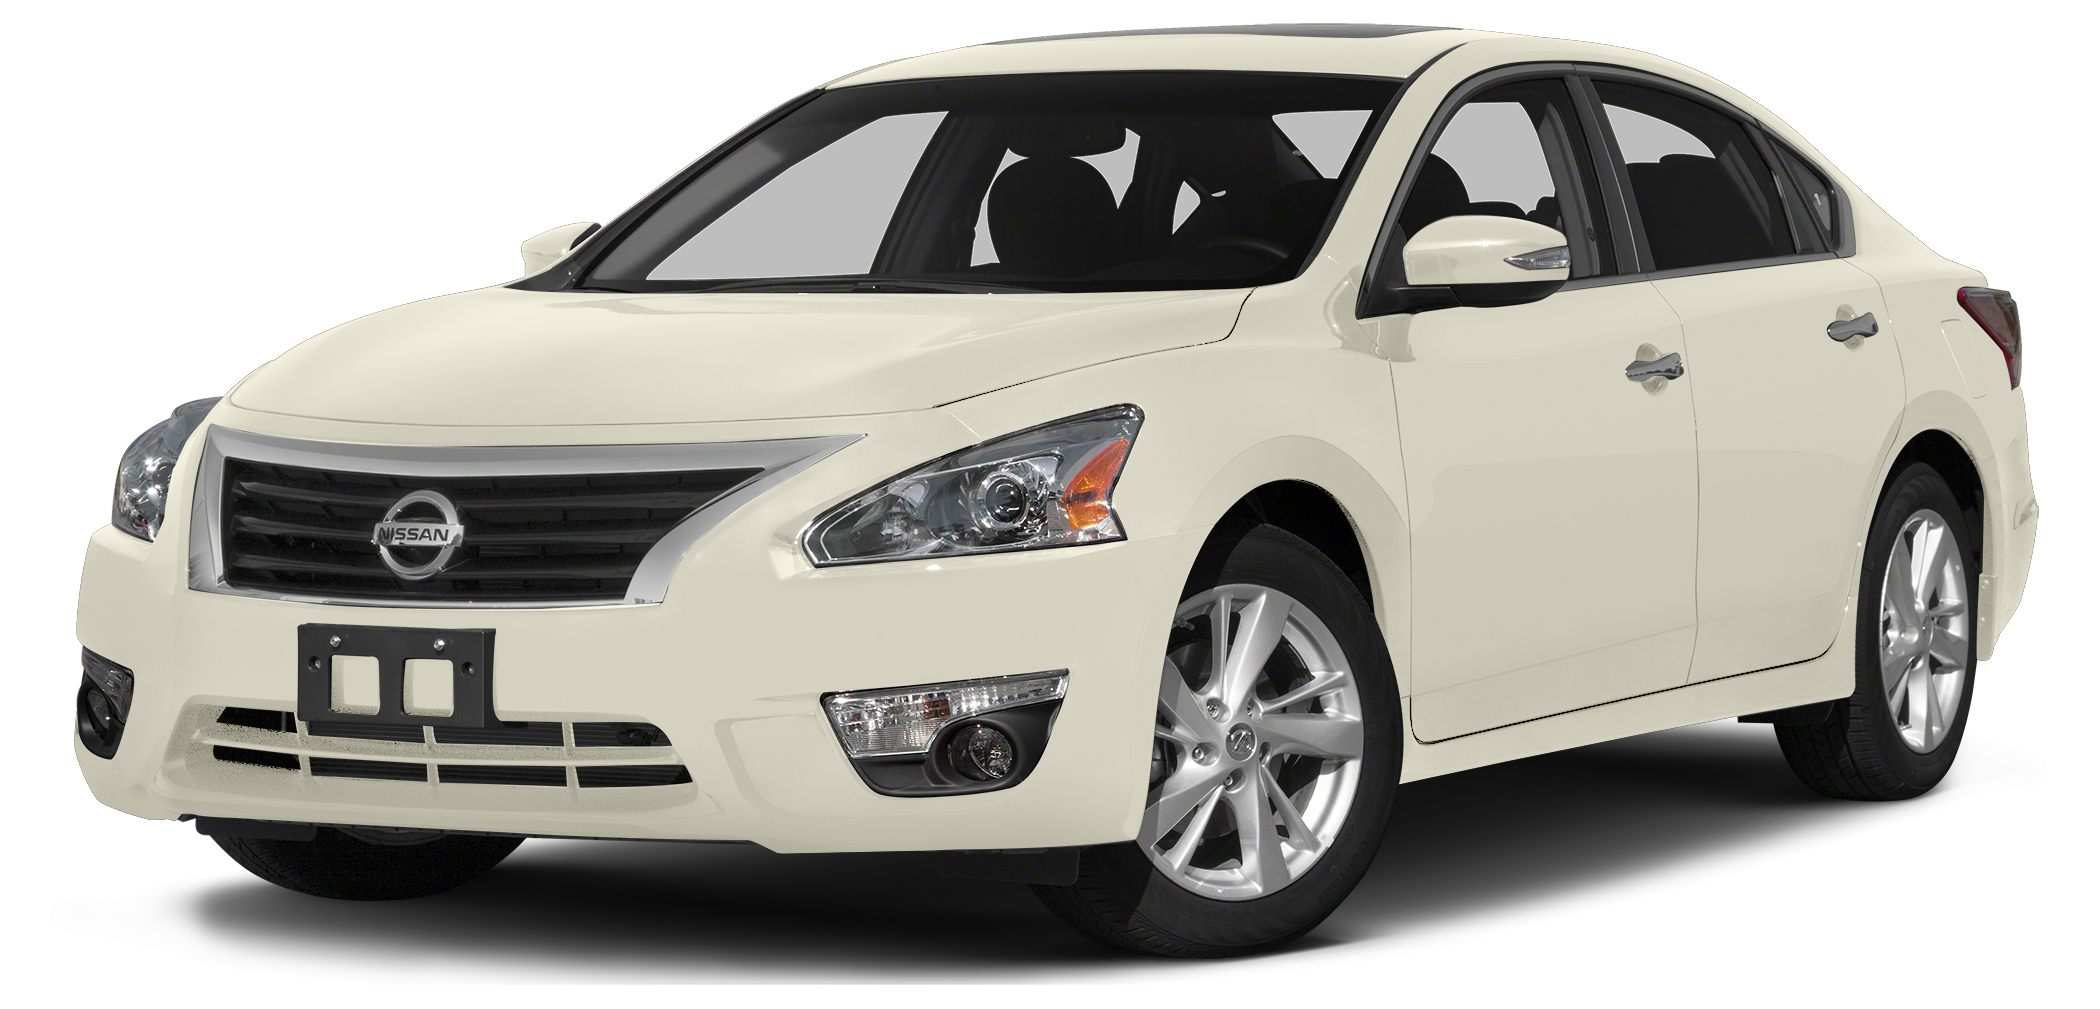 2015 Nissan Altima 25 SL Miles 35469Color Pearl White Stock K16456A VIN 1N4AL3AP3FN307785